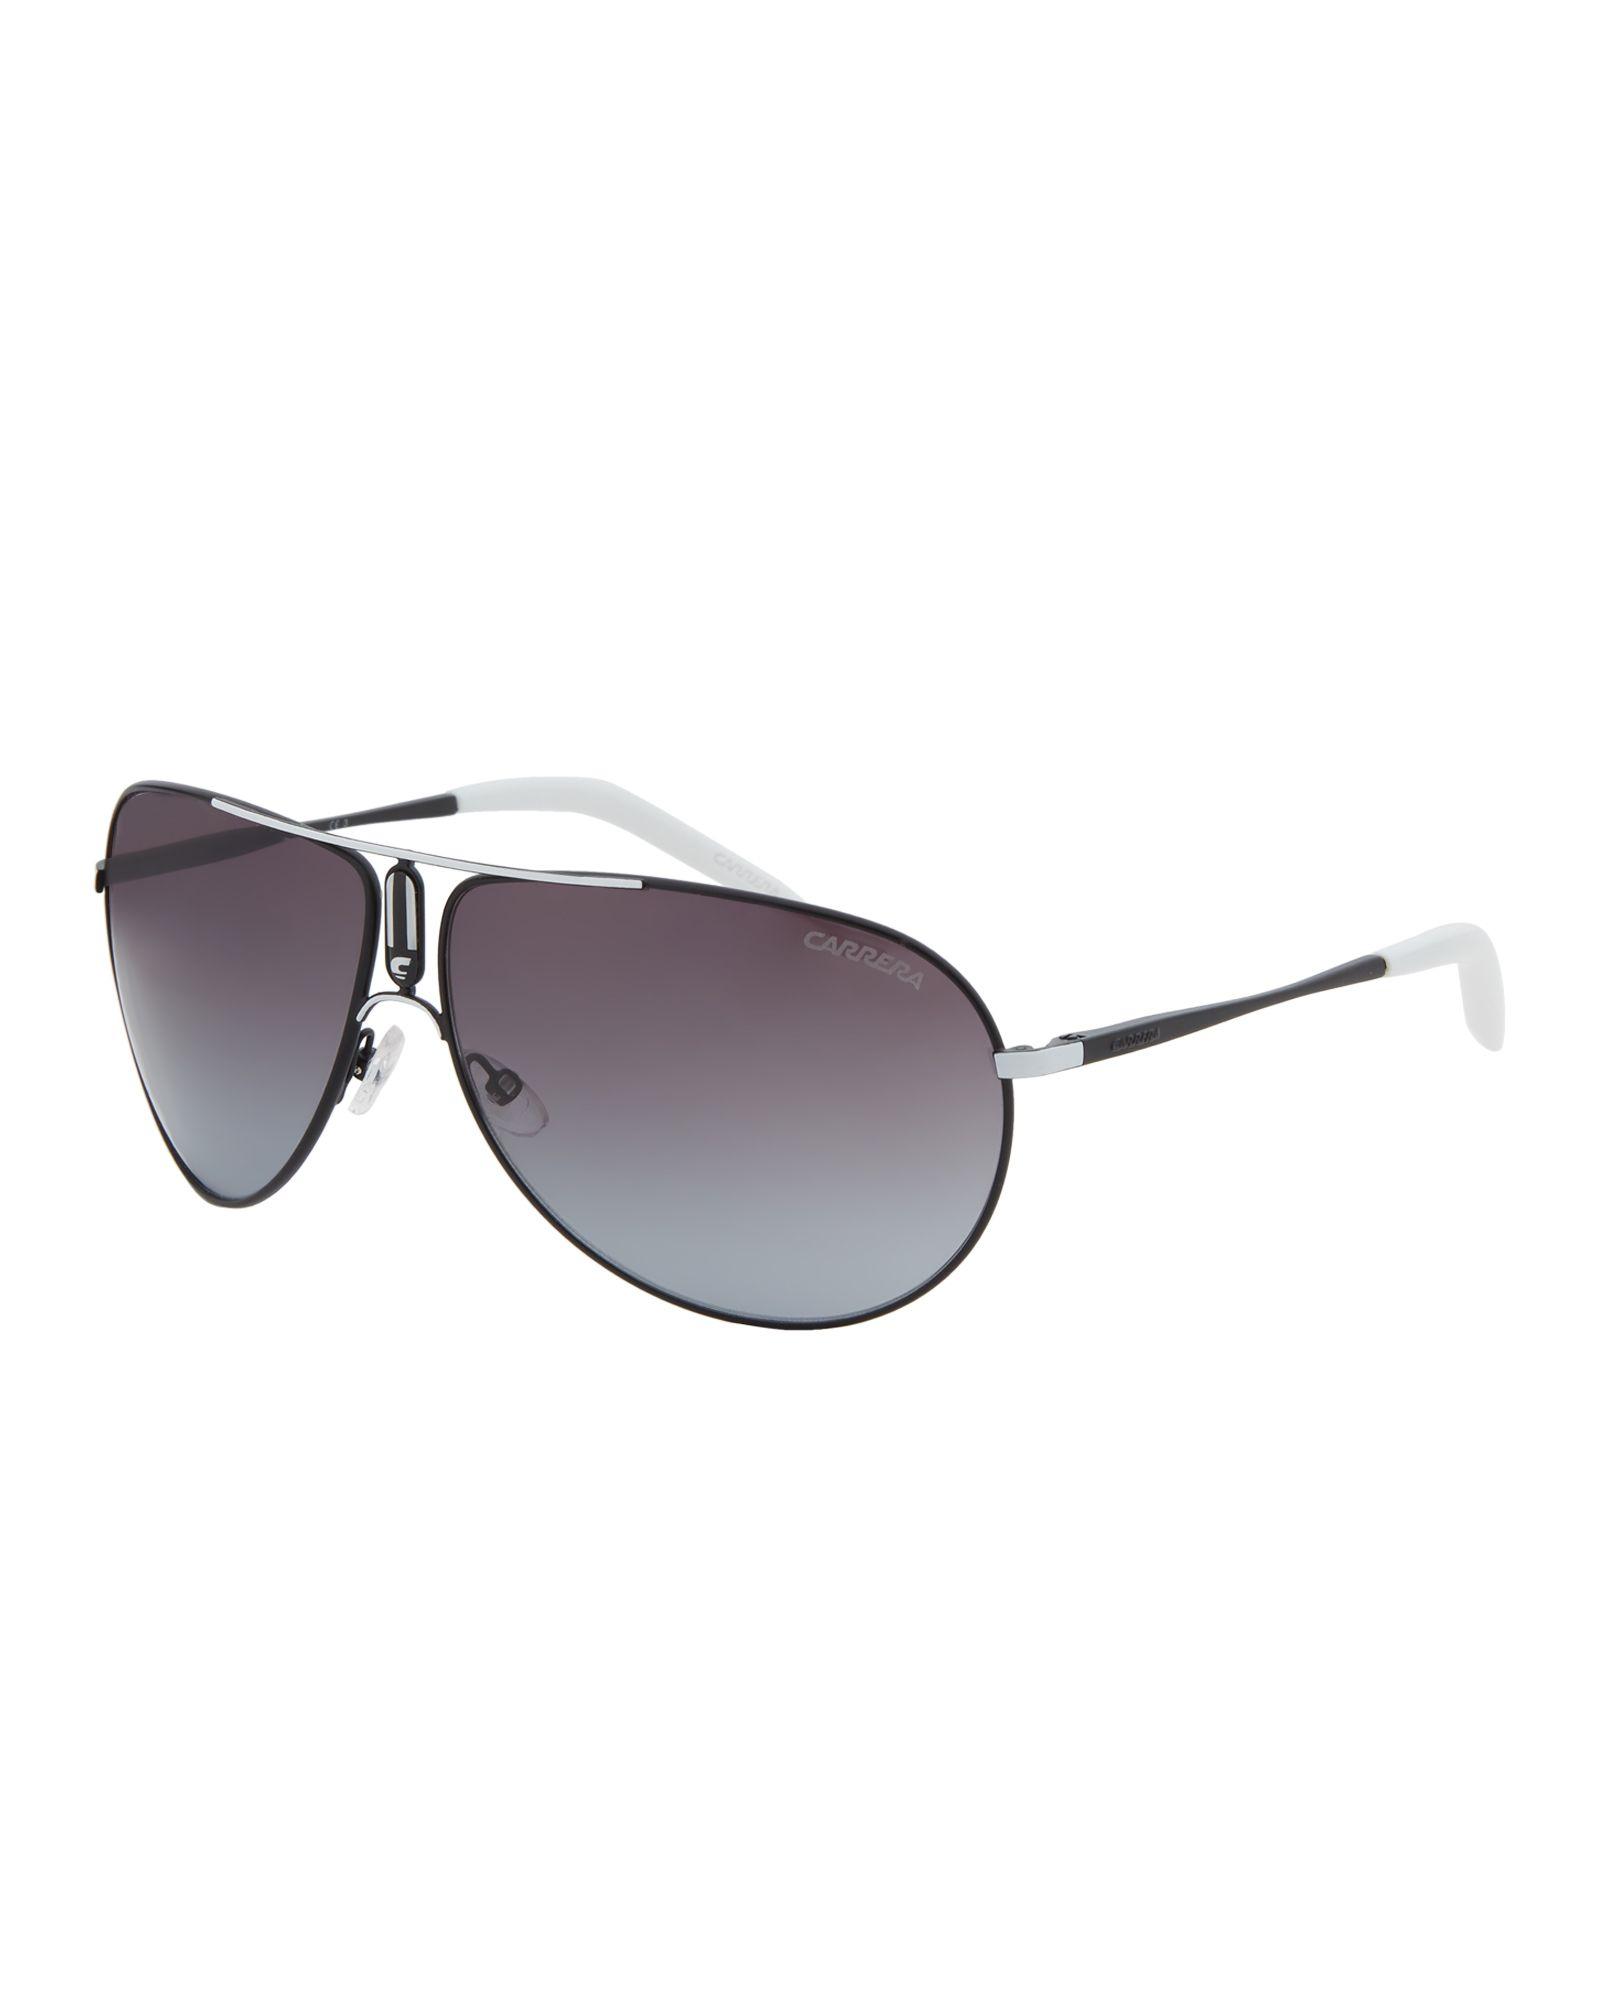 ab2f71e96be4 Carrera GIPSY HMFV4 Two-Tone Aviator Sunglasses | *Apparel ...